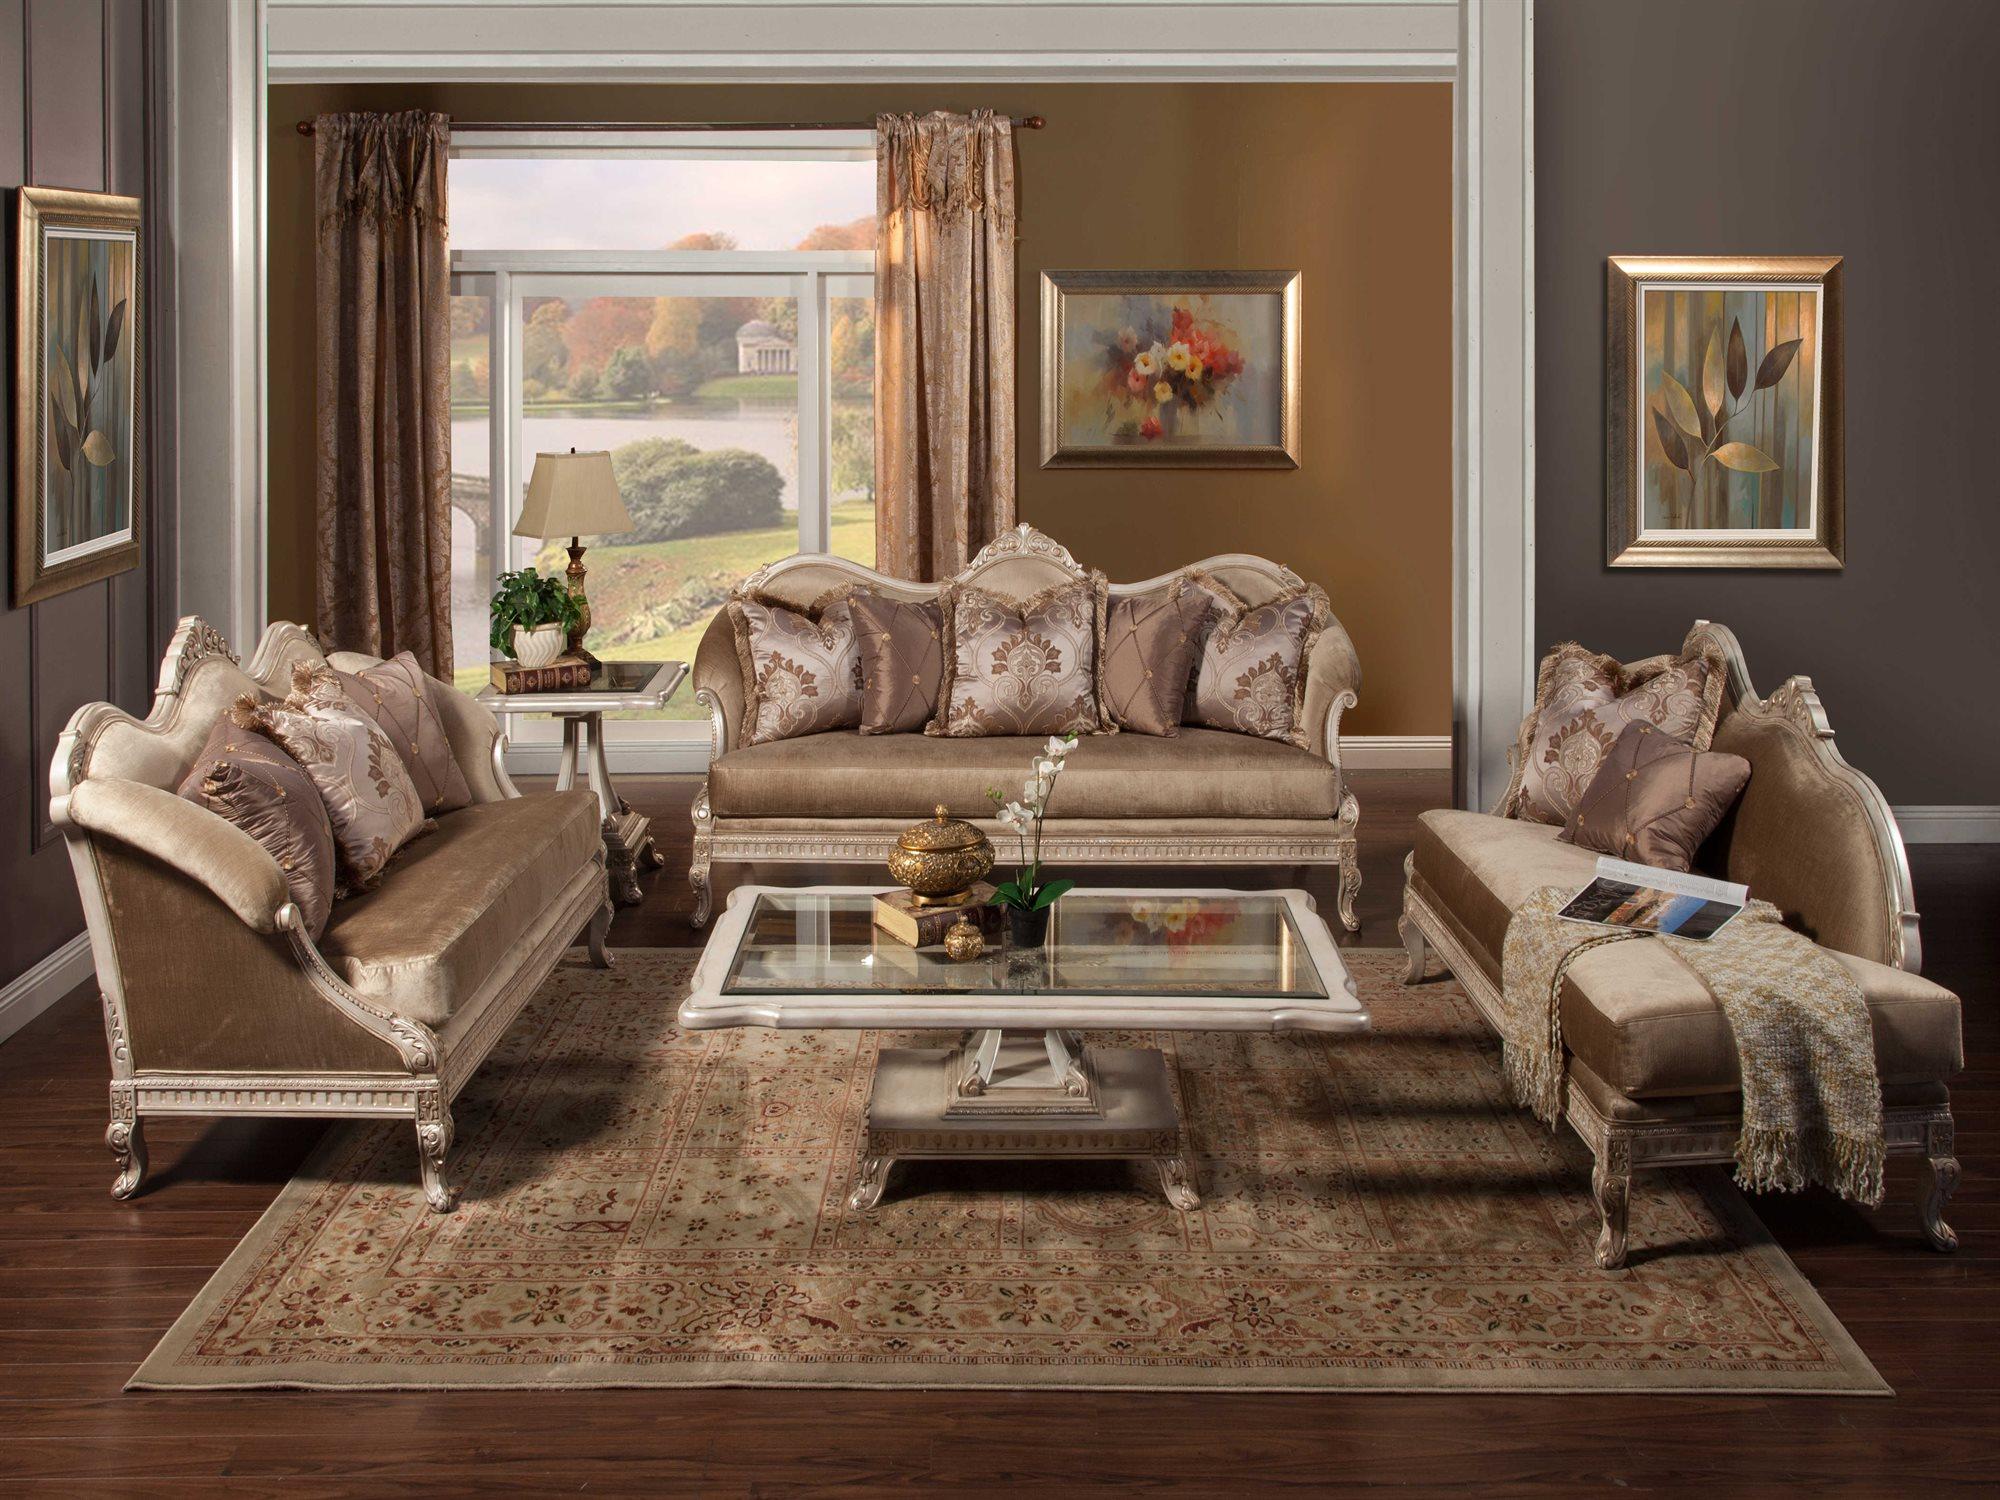 Benetti\'s Italia Furniture Perla Chaise Lounge